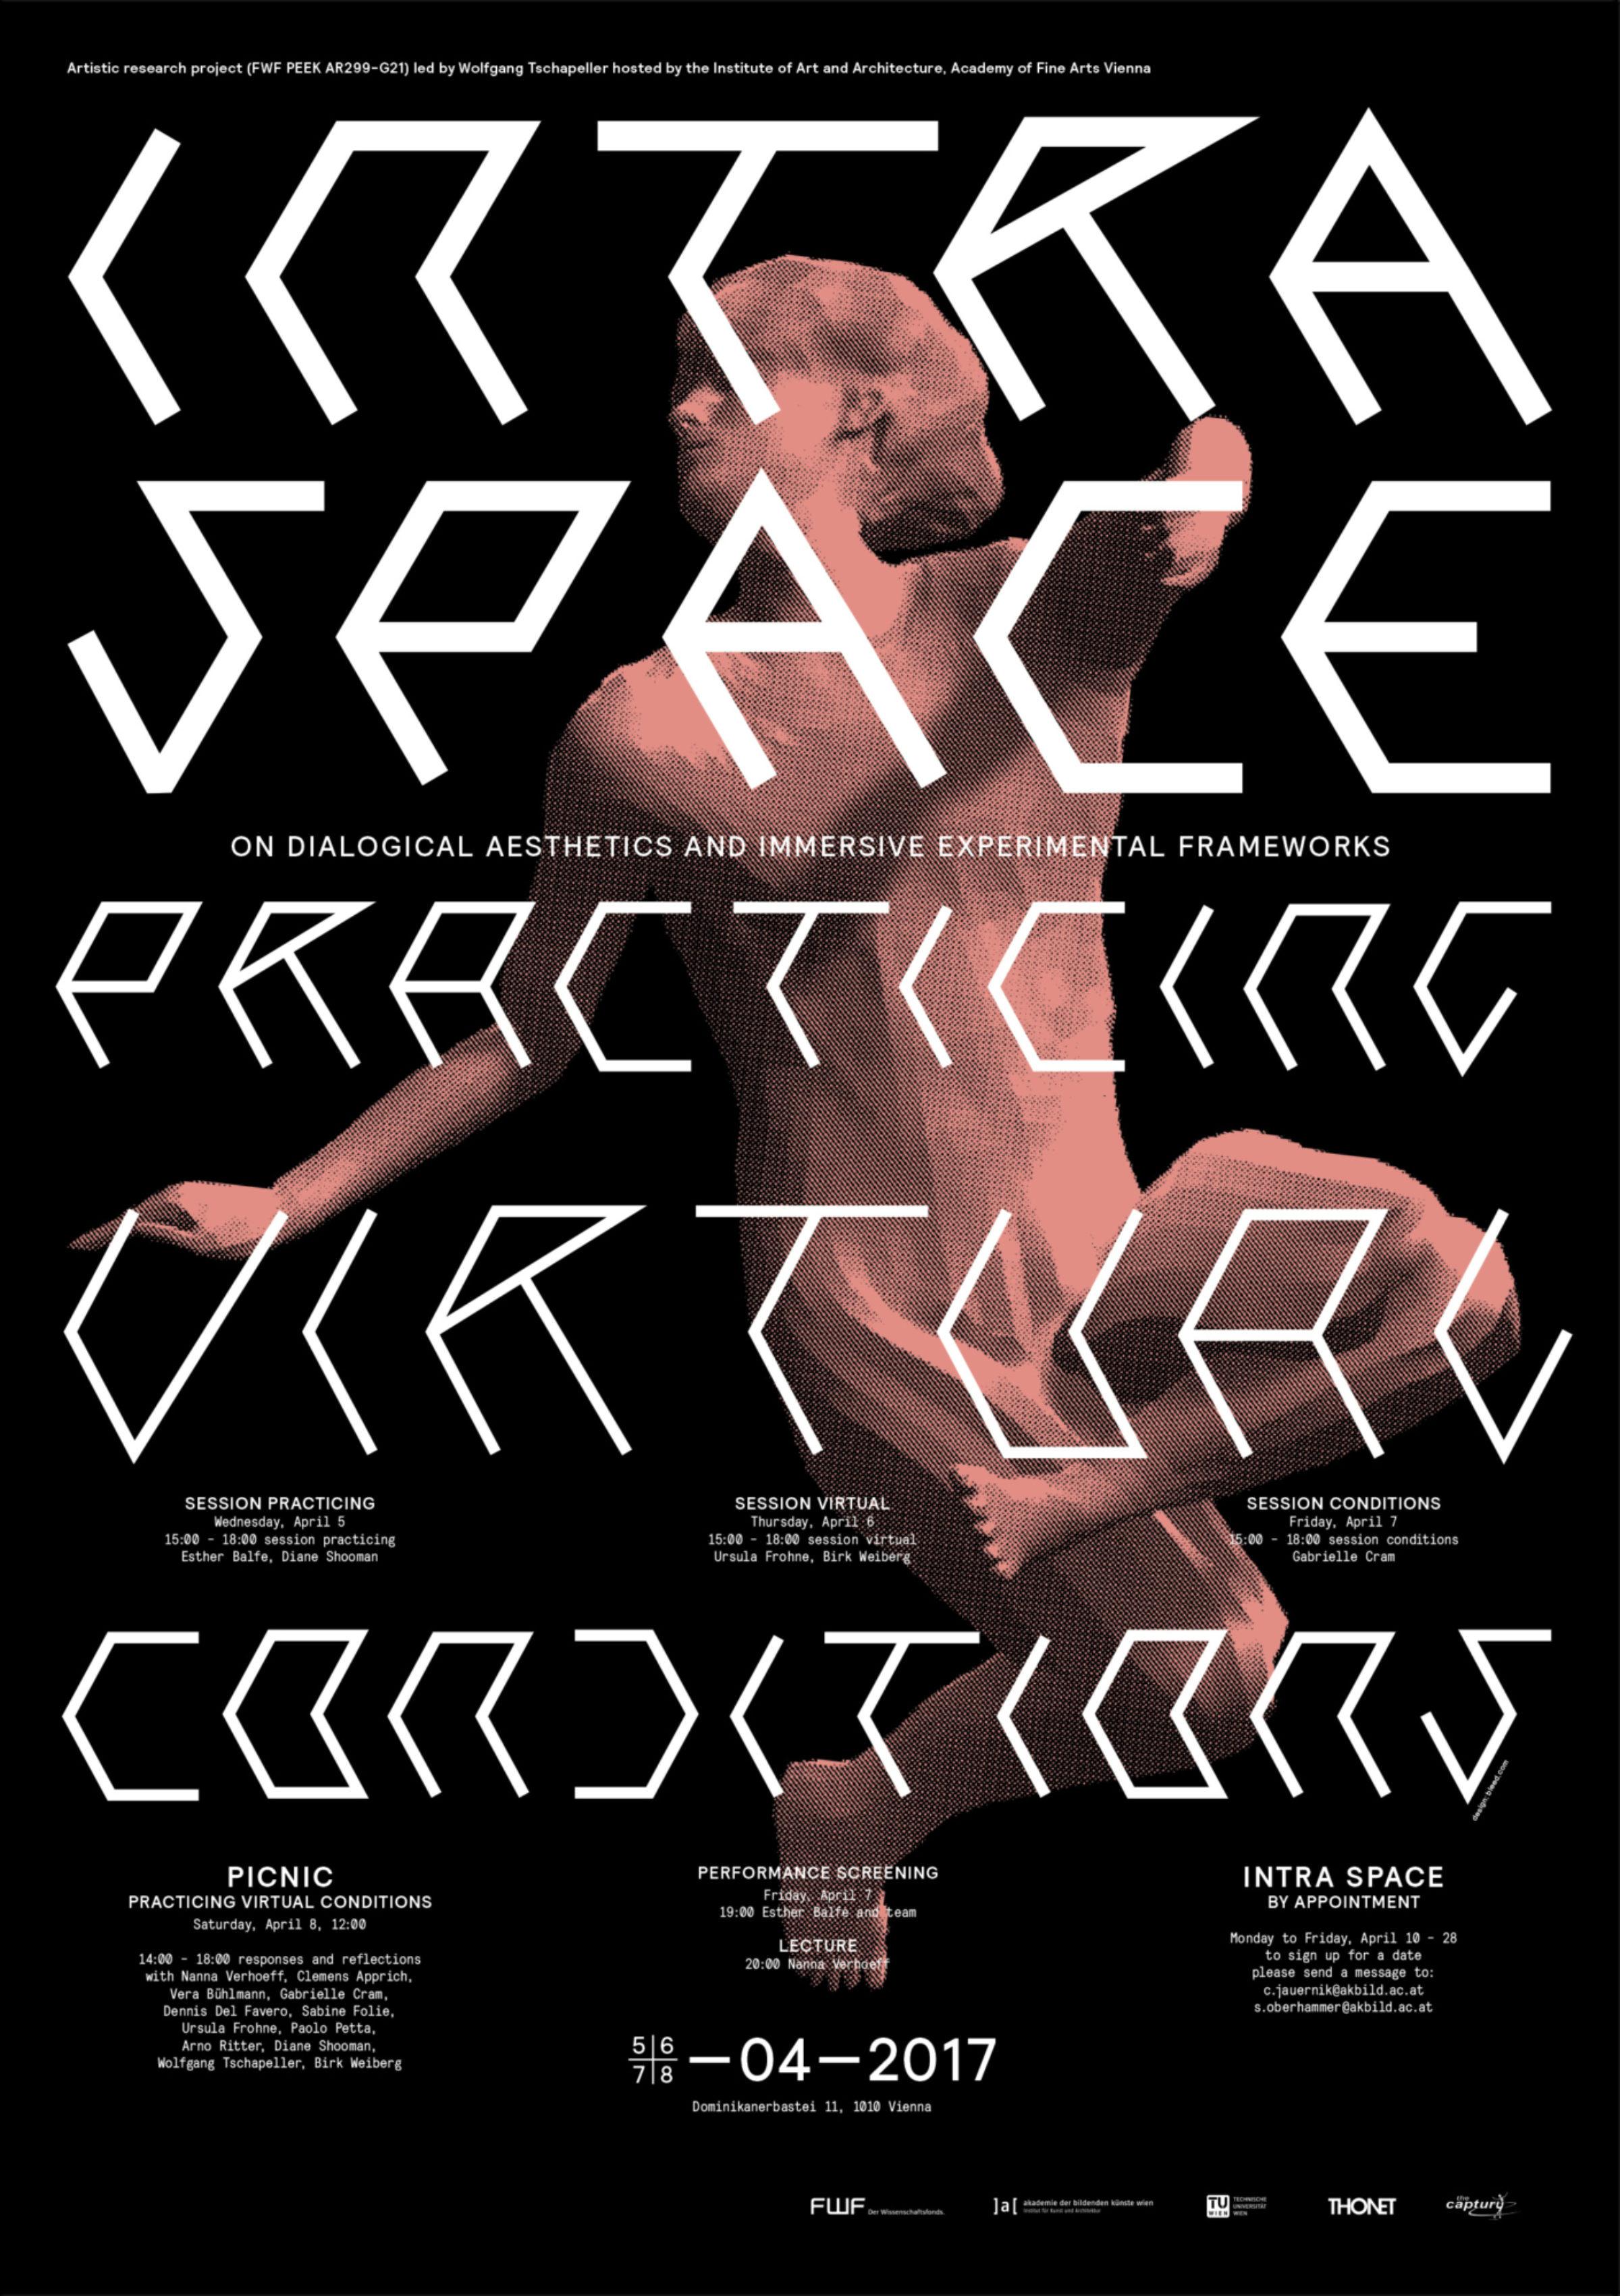 intraspace17_poster_anim_04